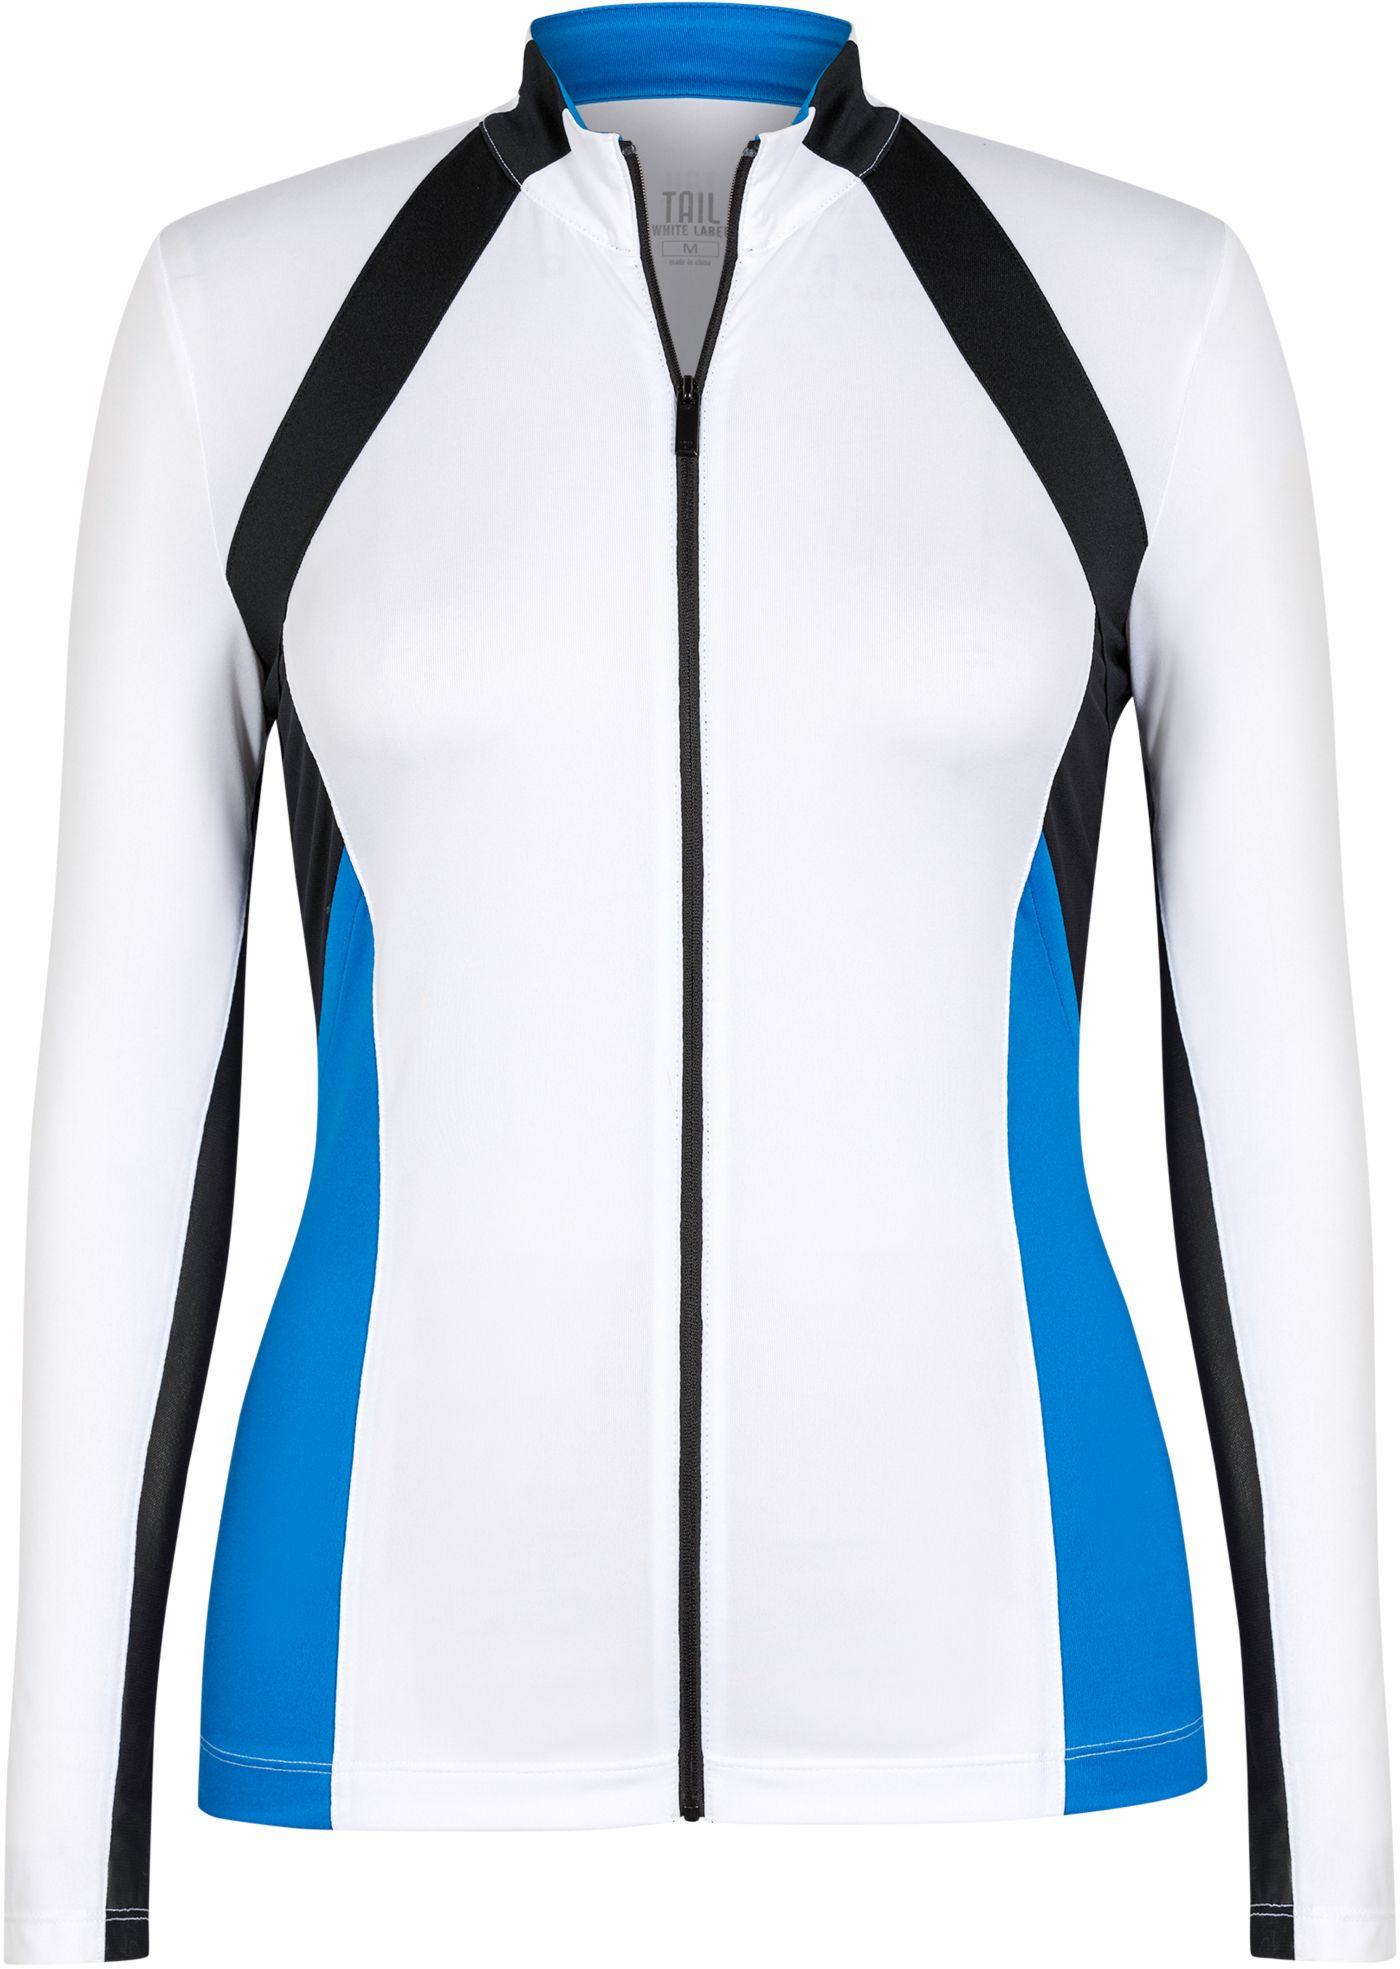 Tail Women's Full-Zip Golf Jacket